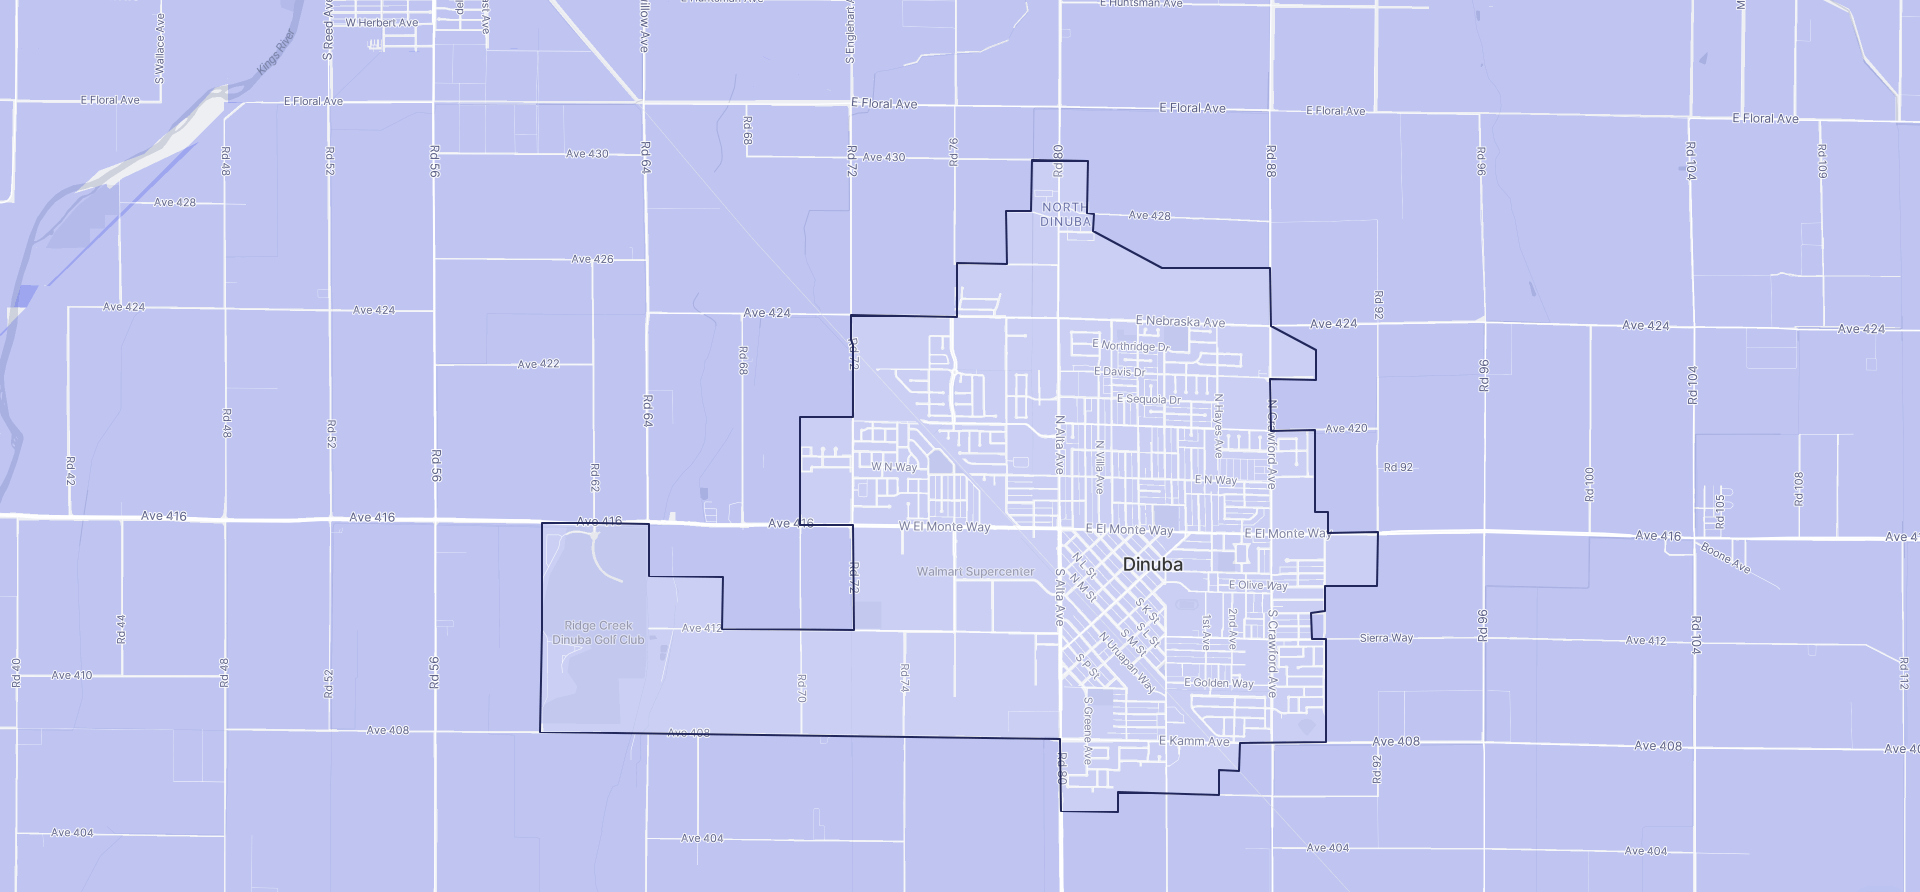 Image of Dinuba boundaries on a map.